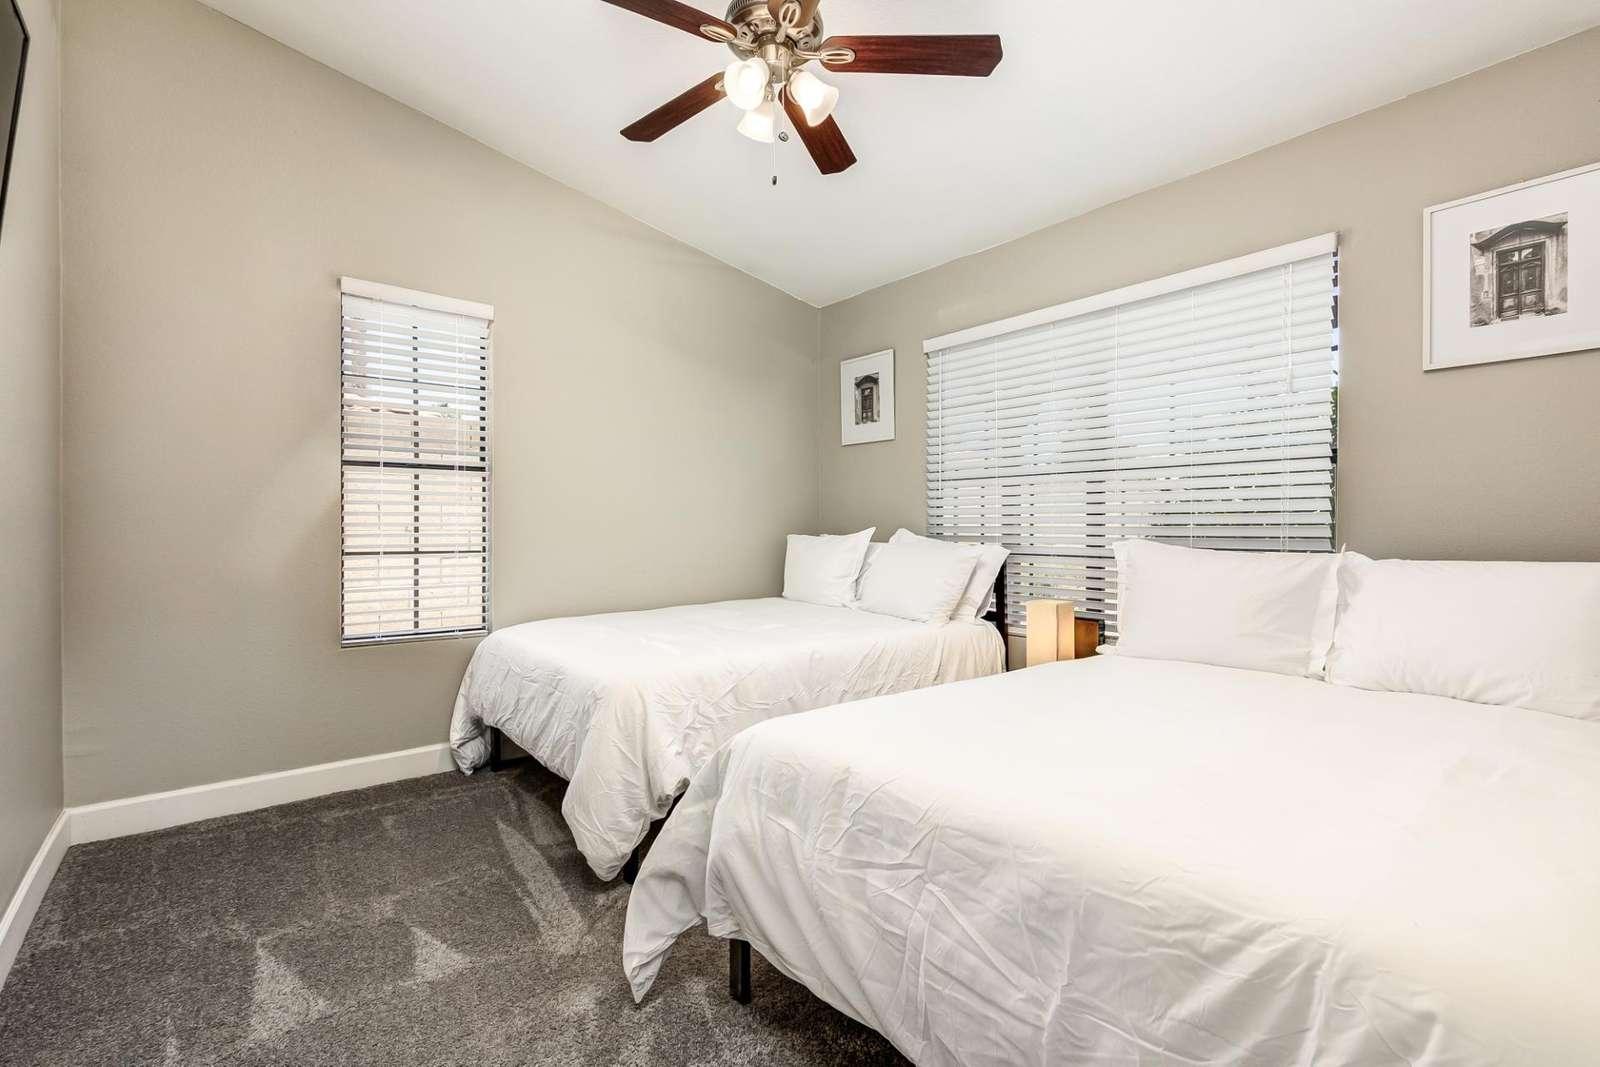 3rd Bedroom has 2 Full Beds - TV